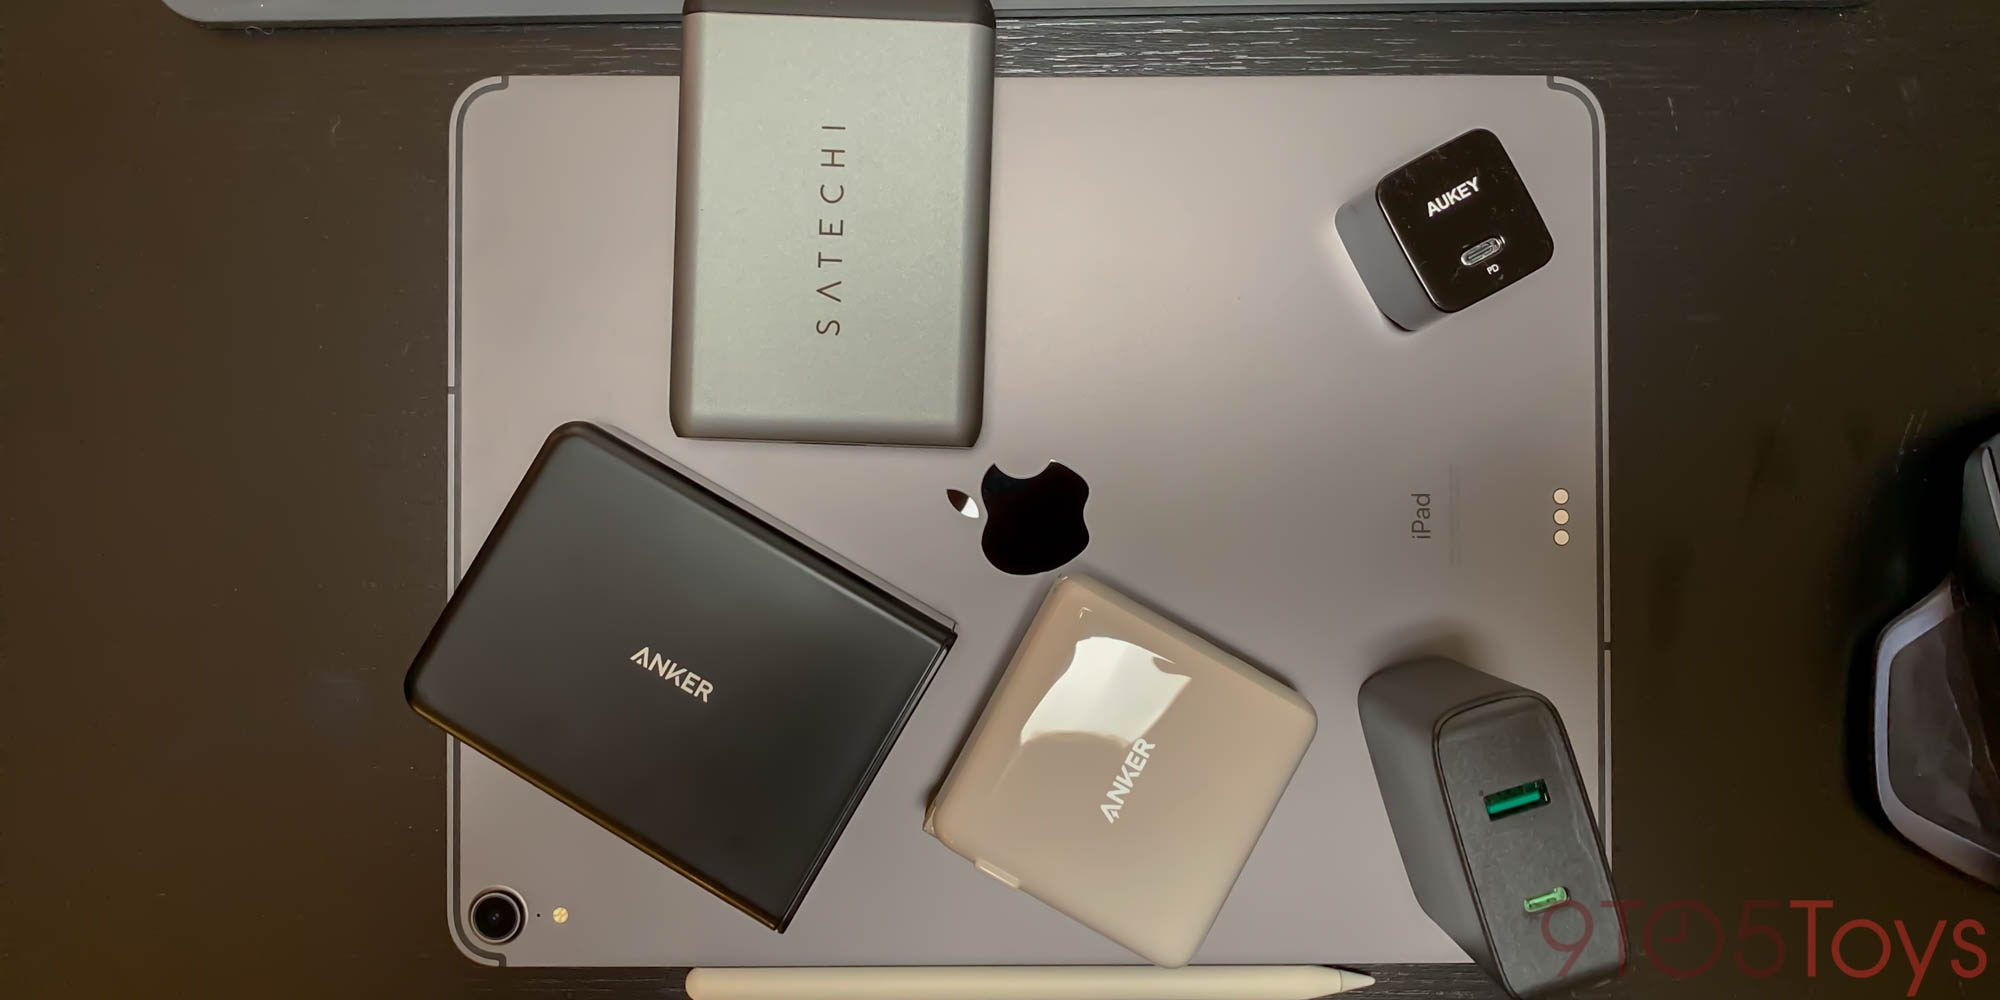 9to5Toys Letzter Anruf: Garmin fenix 5S GPS Watch $ 400, LG Chromecast Soundbar $ 280, Honeywell Assistant Thermostat $ 123, mehr